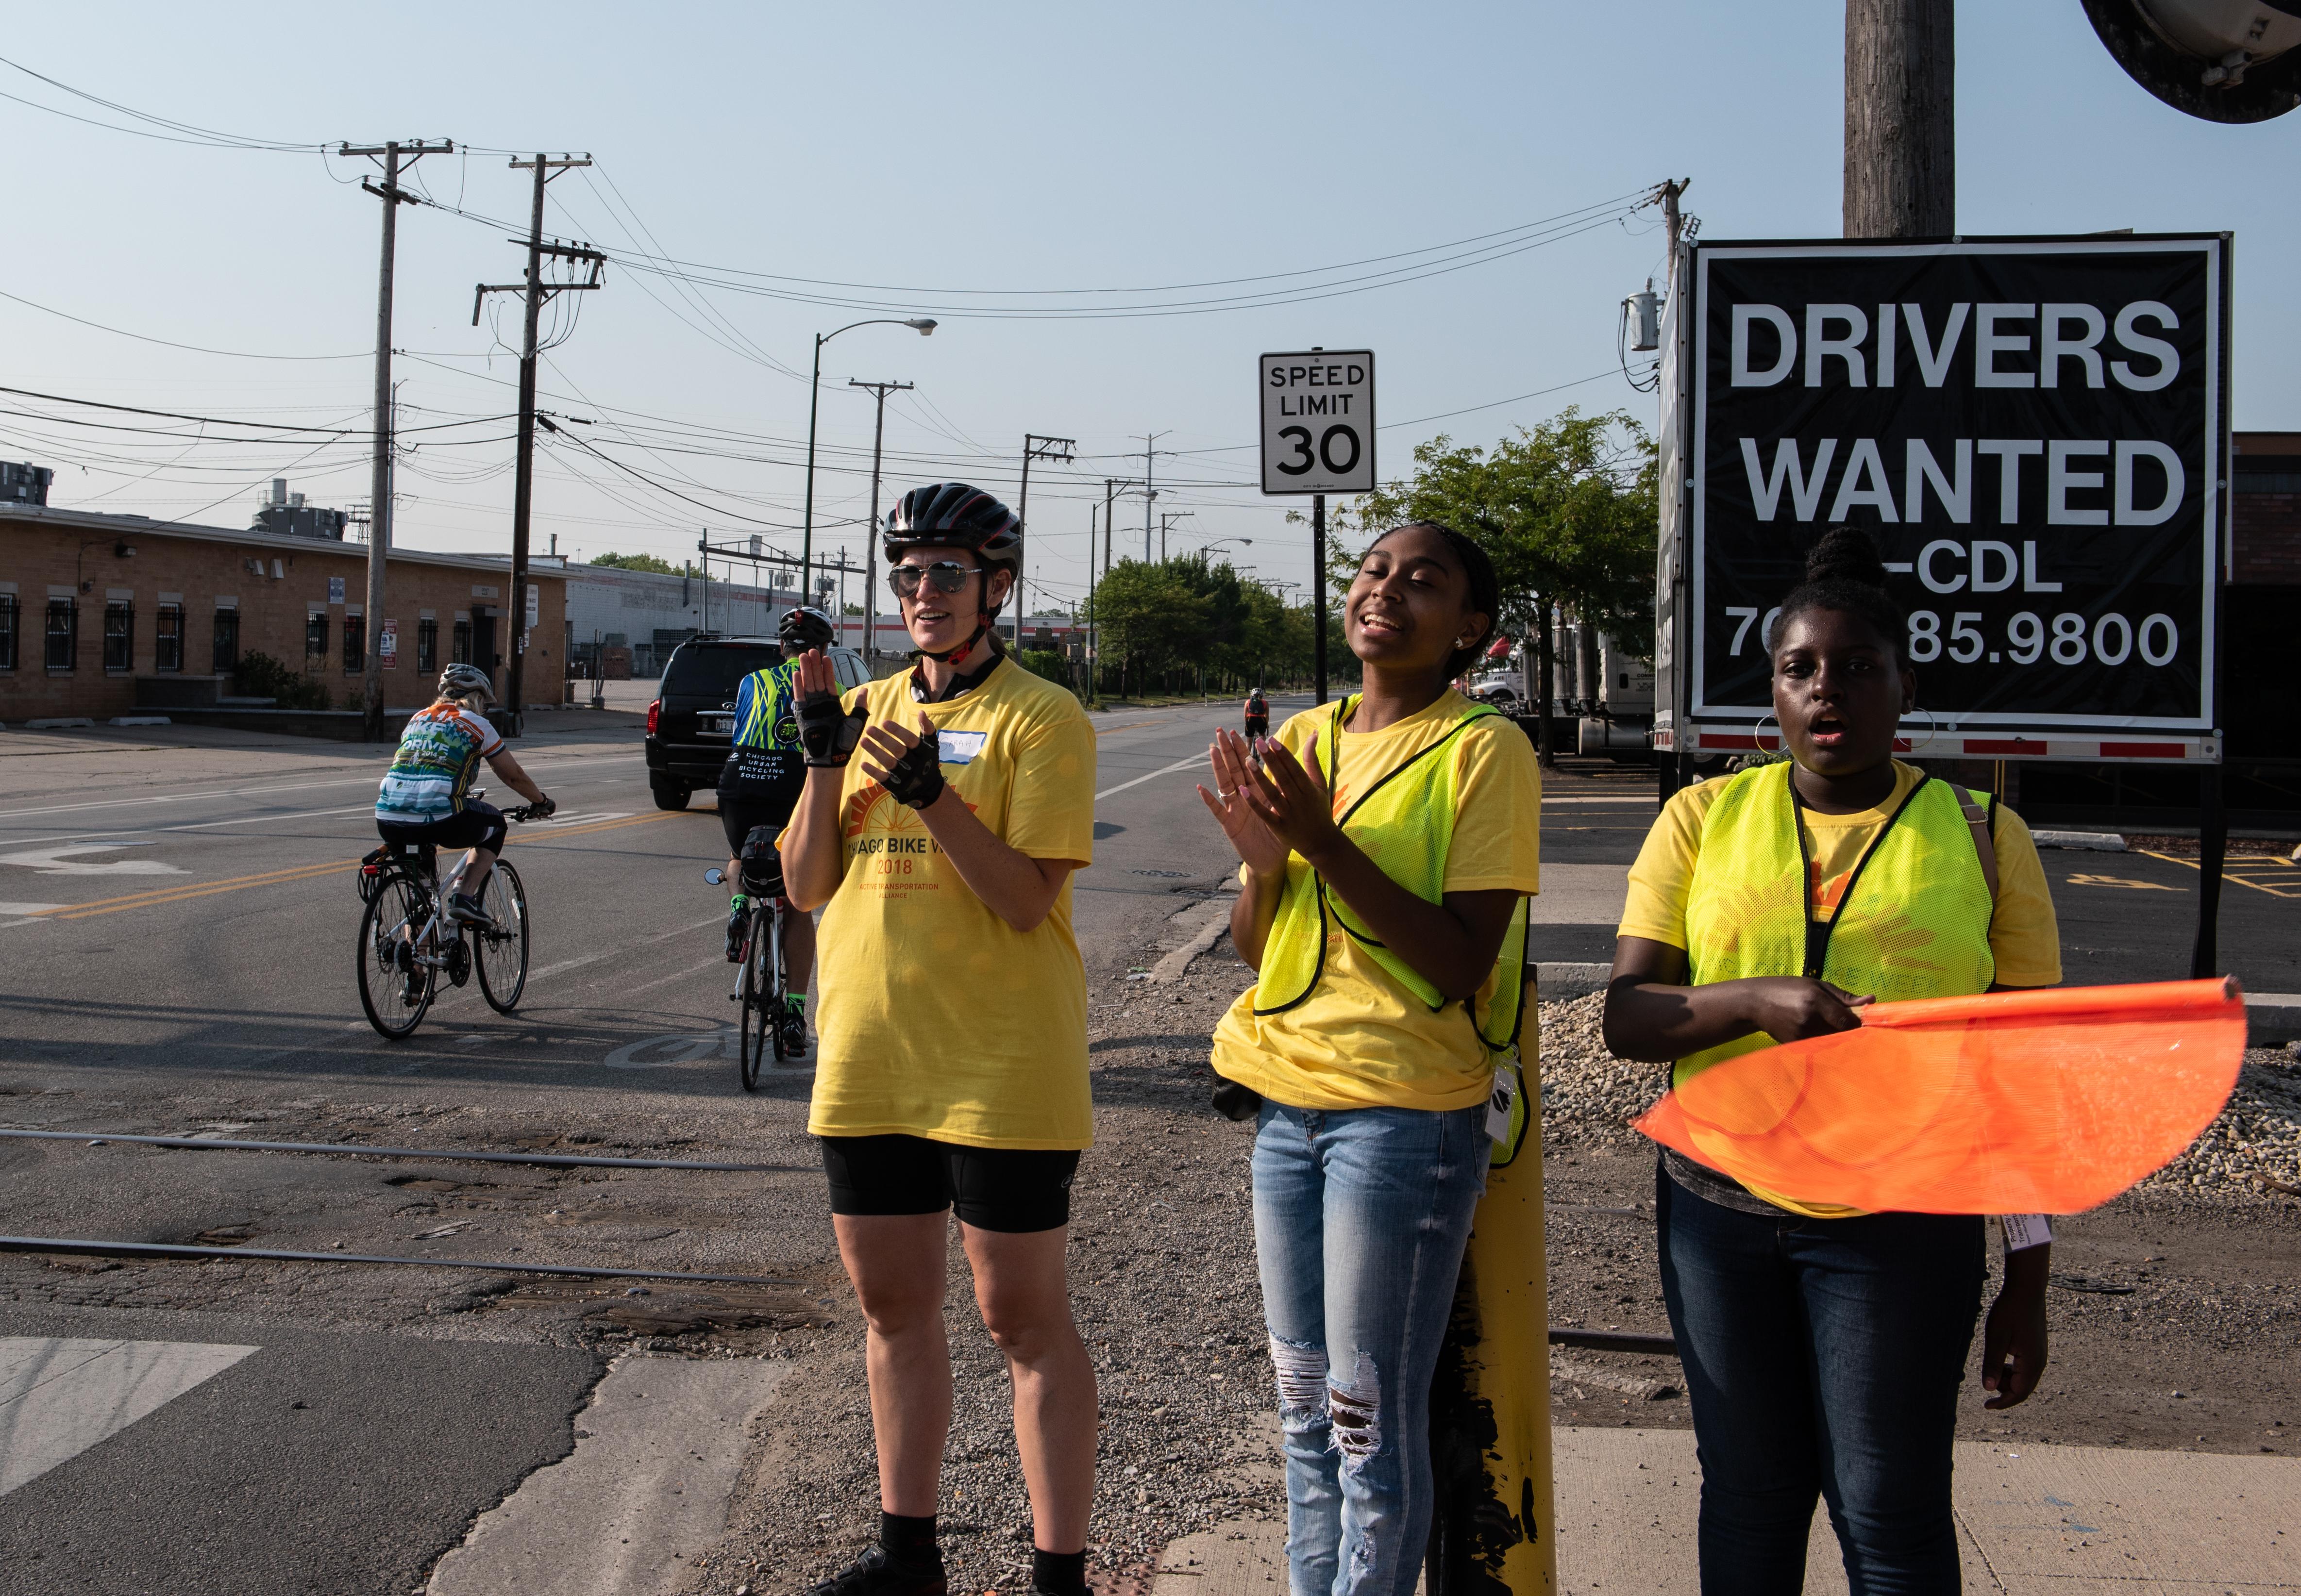 Community Service Organization - Volunteer for Boulevard Lakefront Tour bike ride!  5